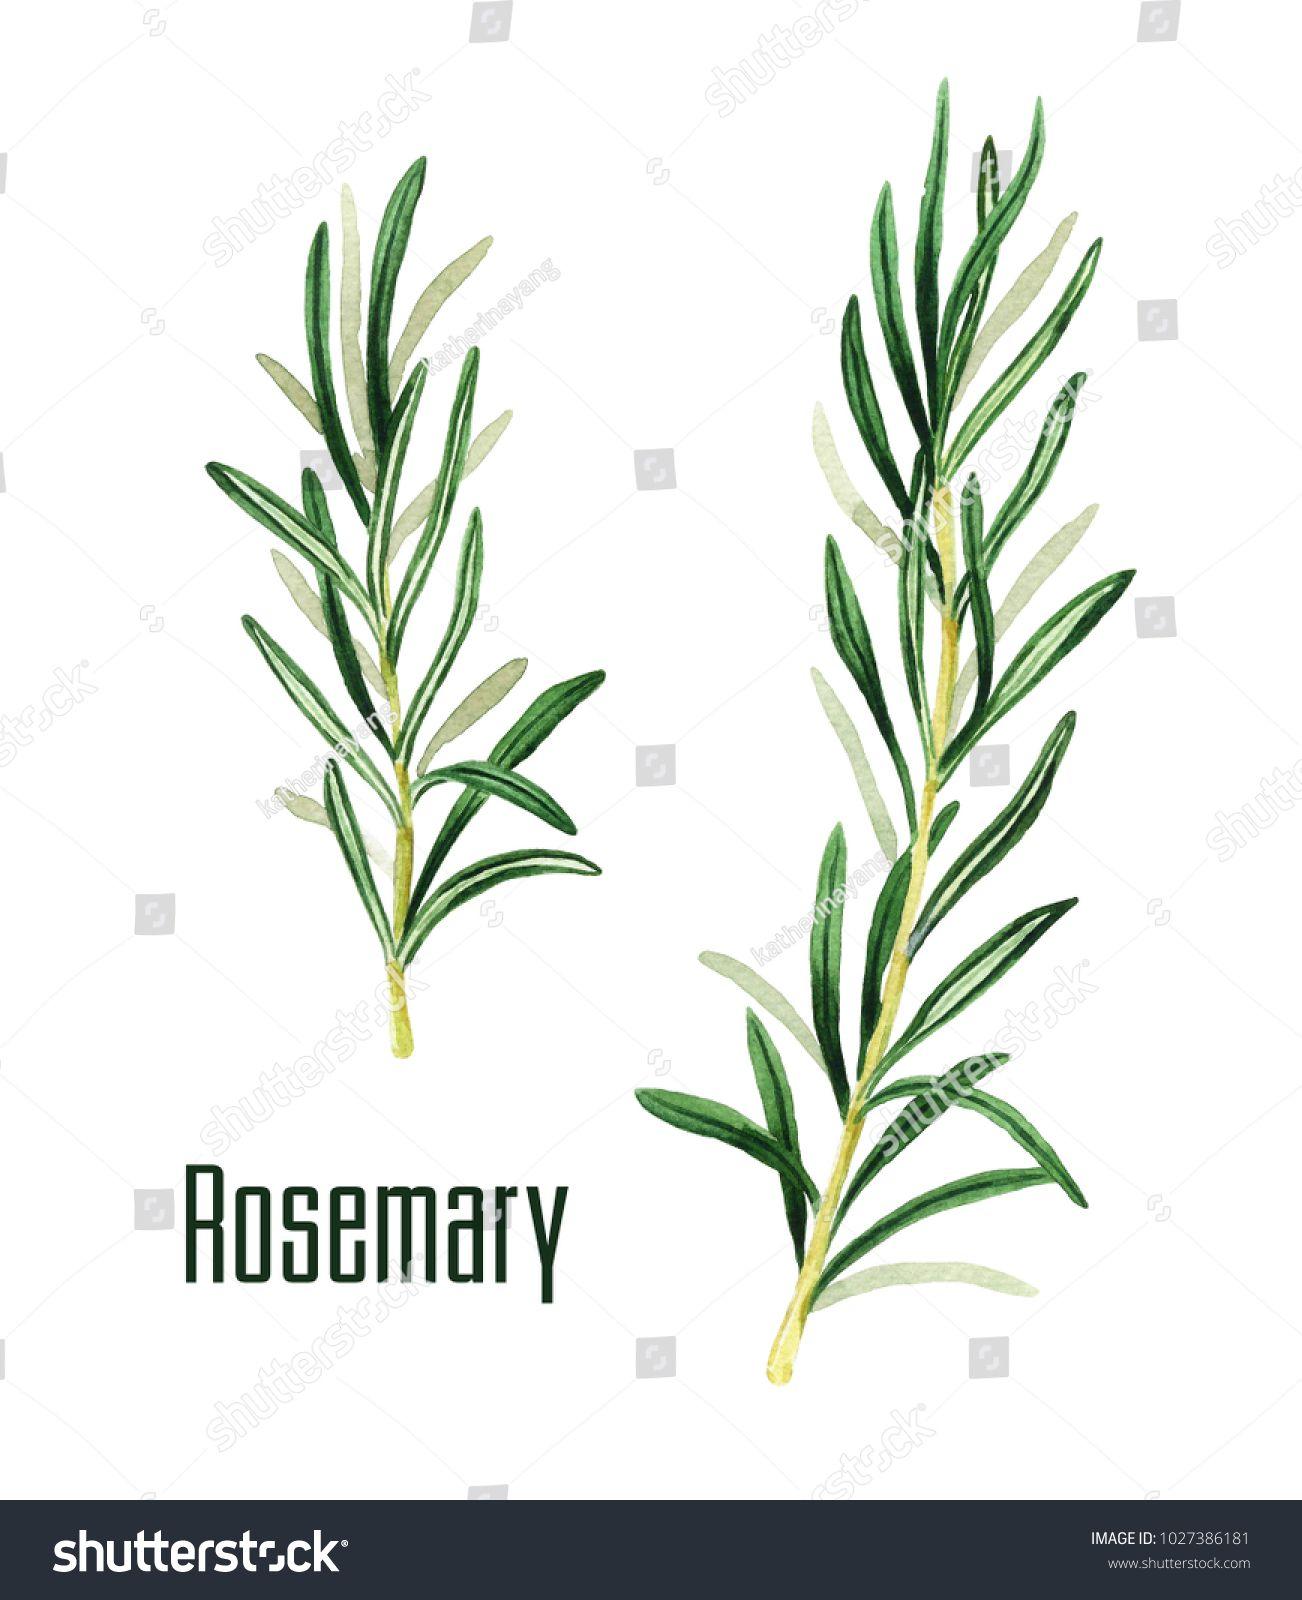 Rosemary Watercolor Branch Hand Drawn Illustration